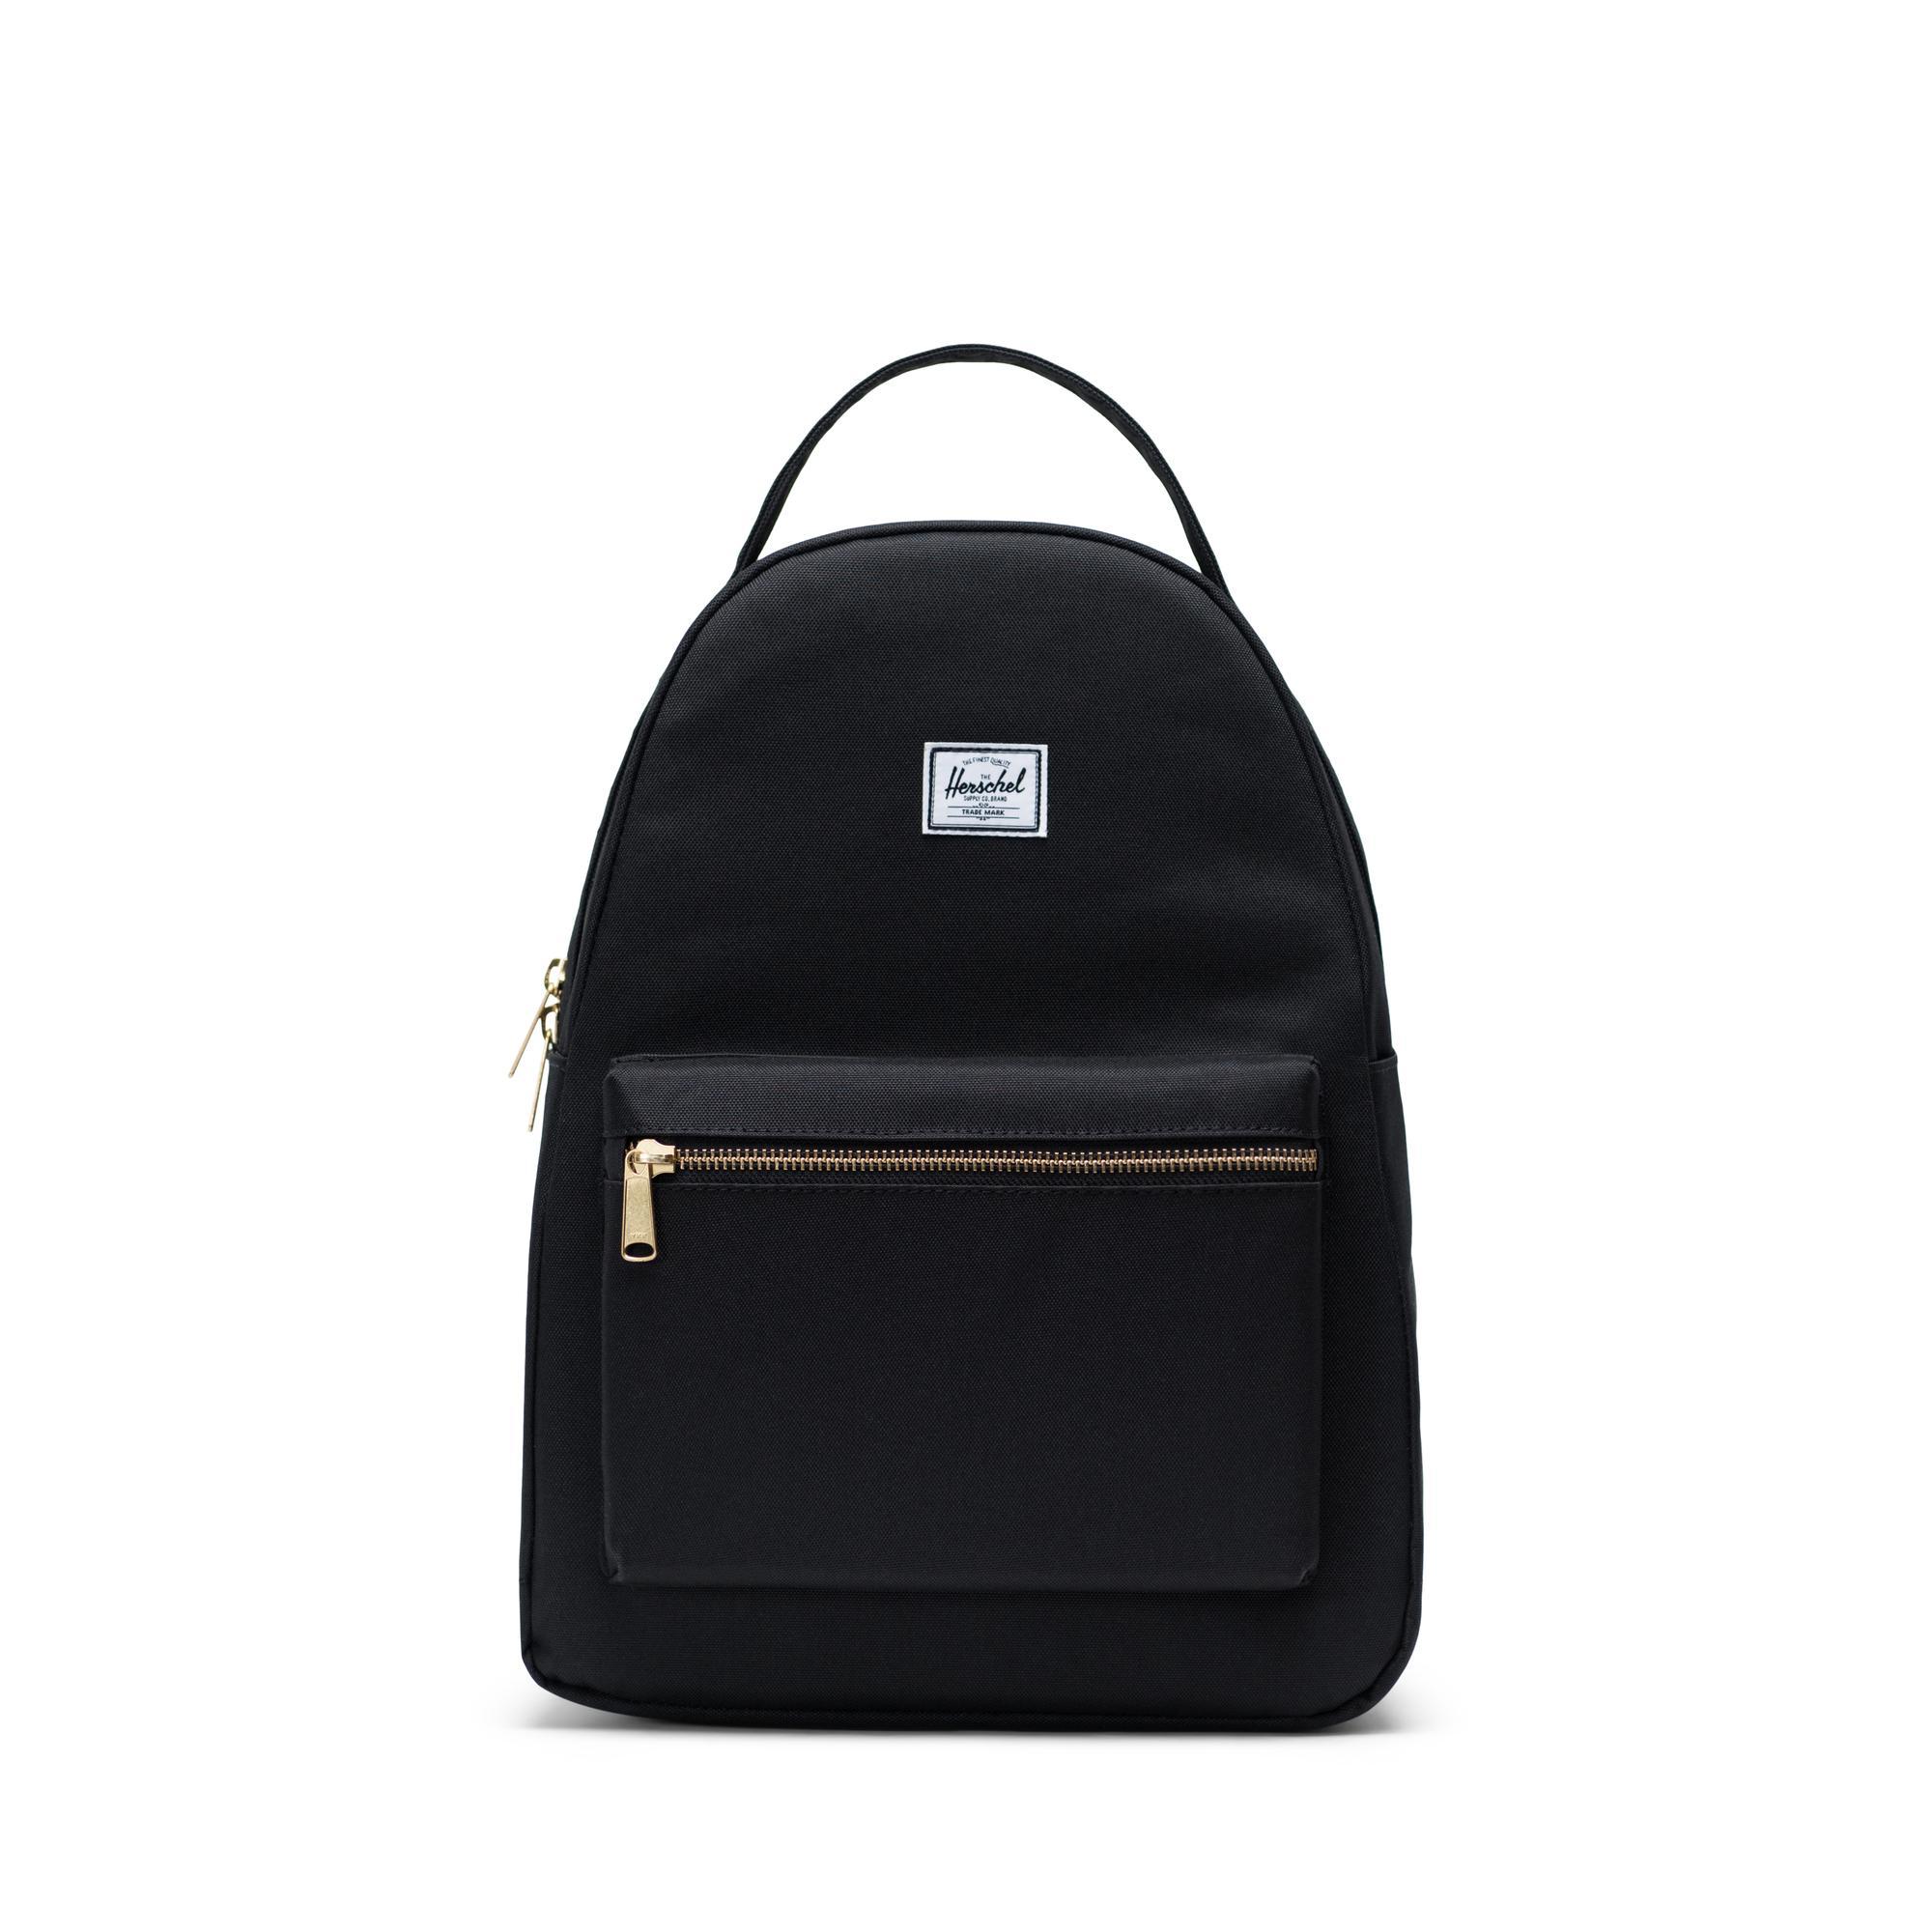 0b2d1568a5d8 Nova Backpack Mid-Volume